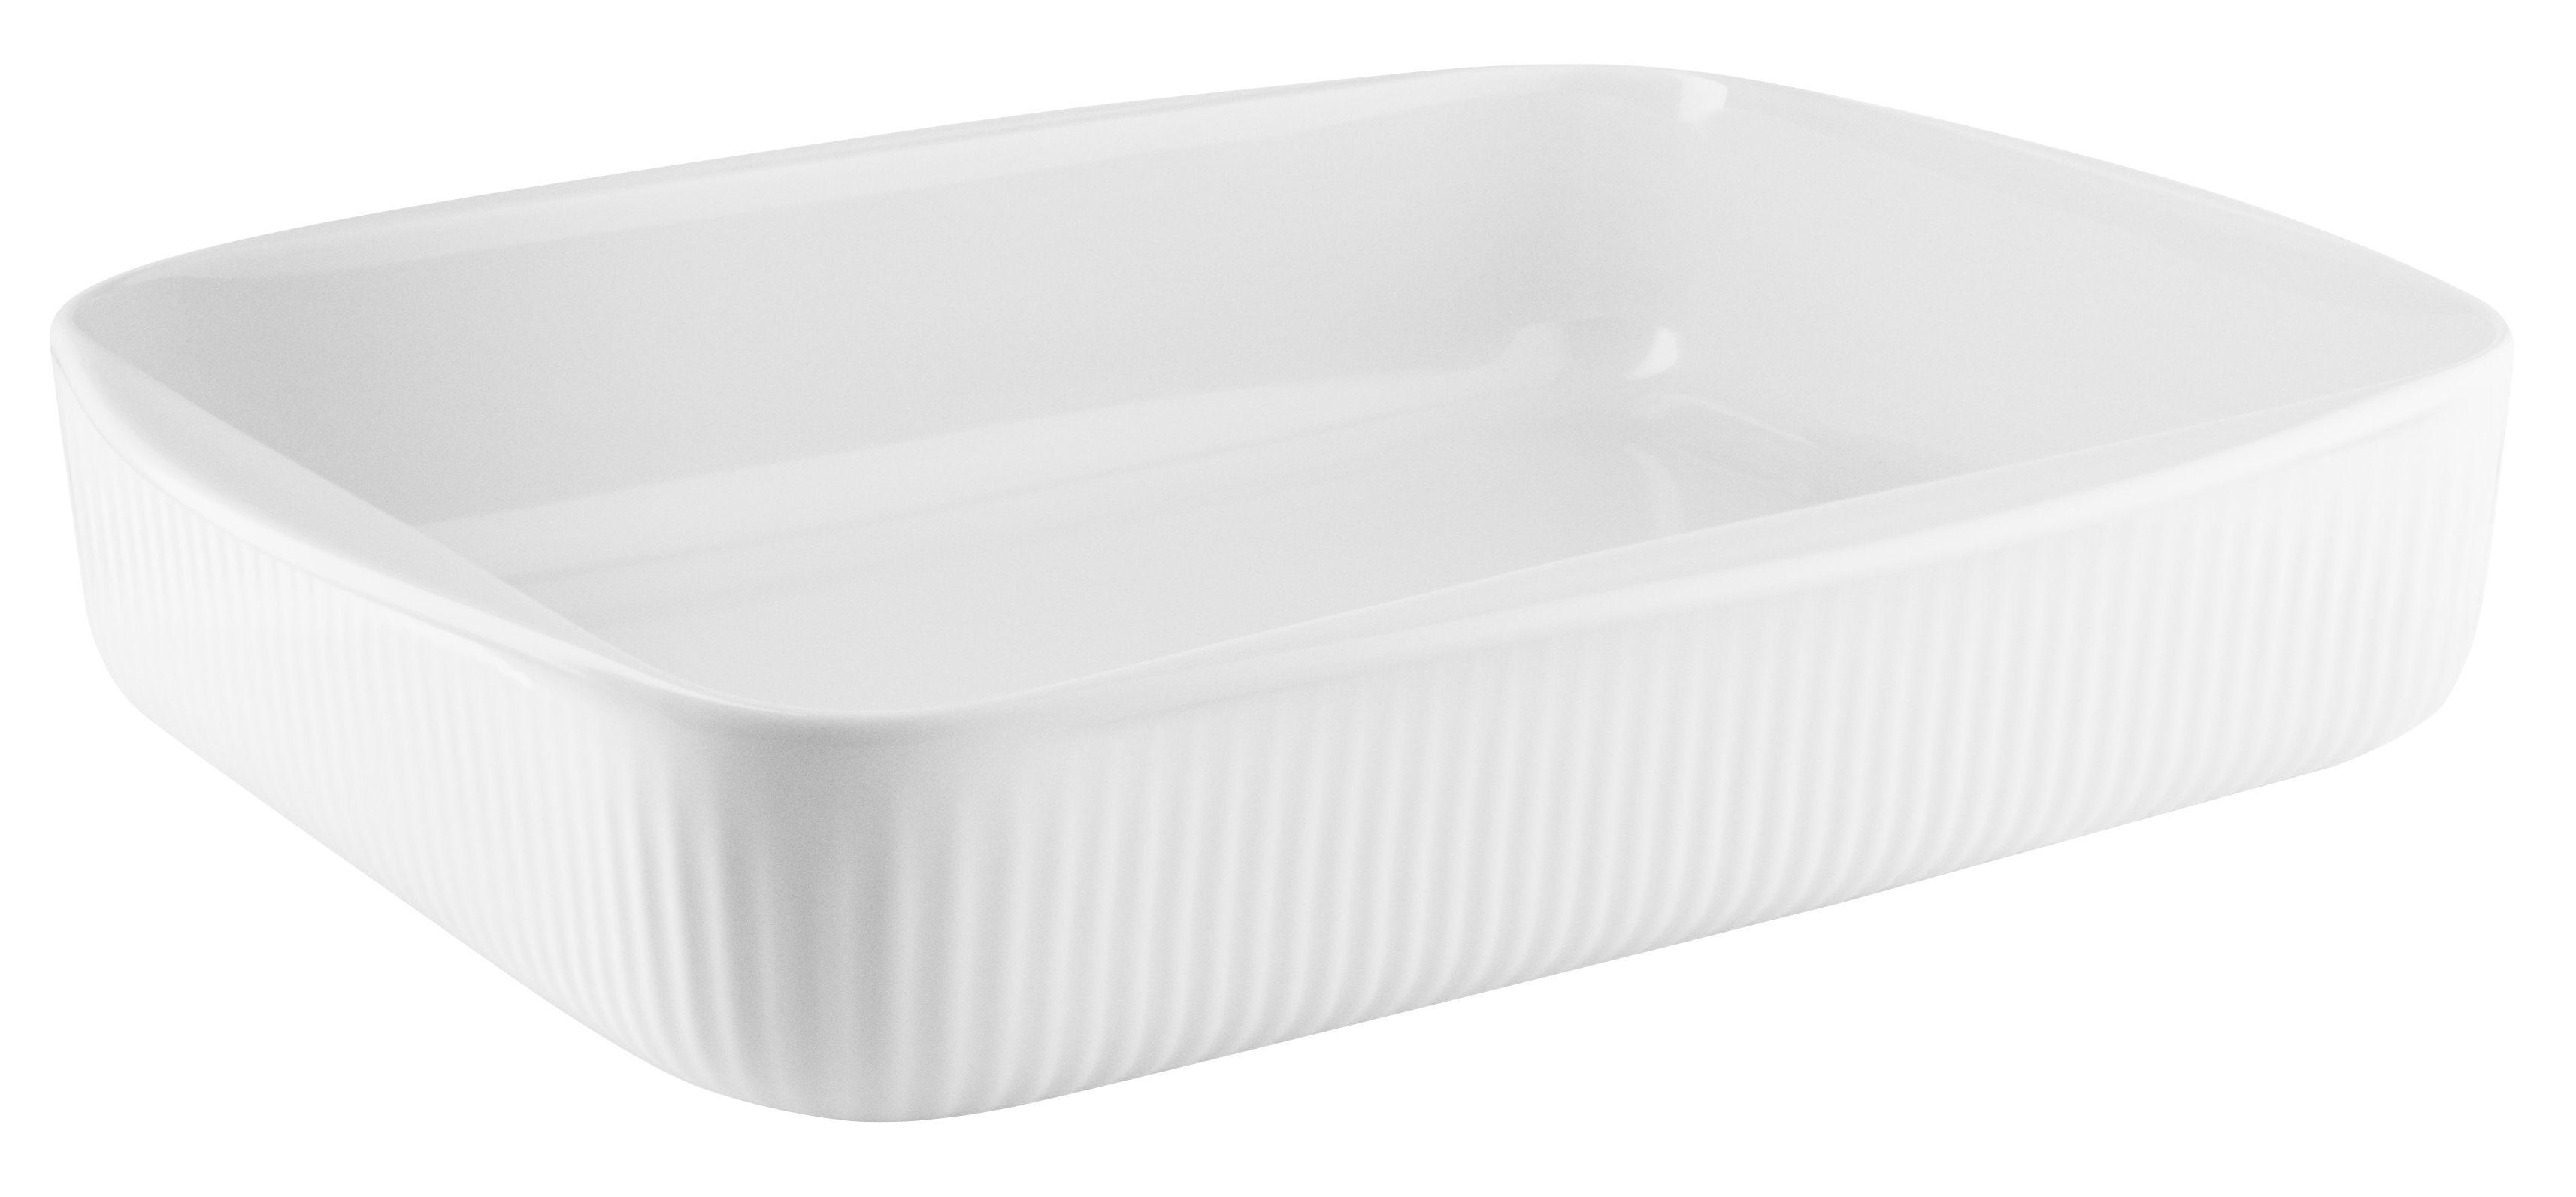 Tableware - Serving Plates - Legio Nova Baking dish - / Medium - 31 x 24.5 cm by Eva Trio - Medium / White - China